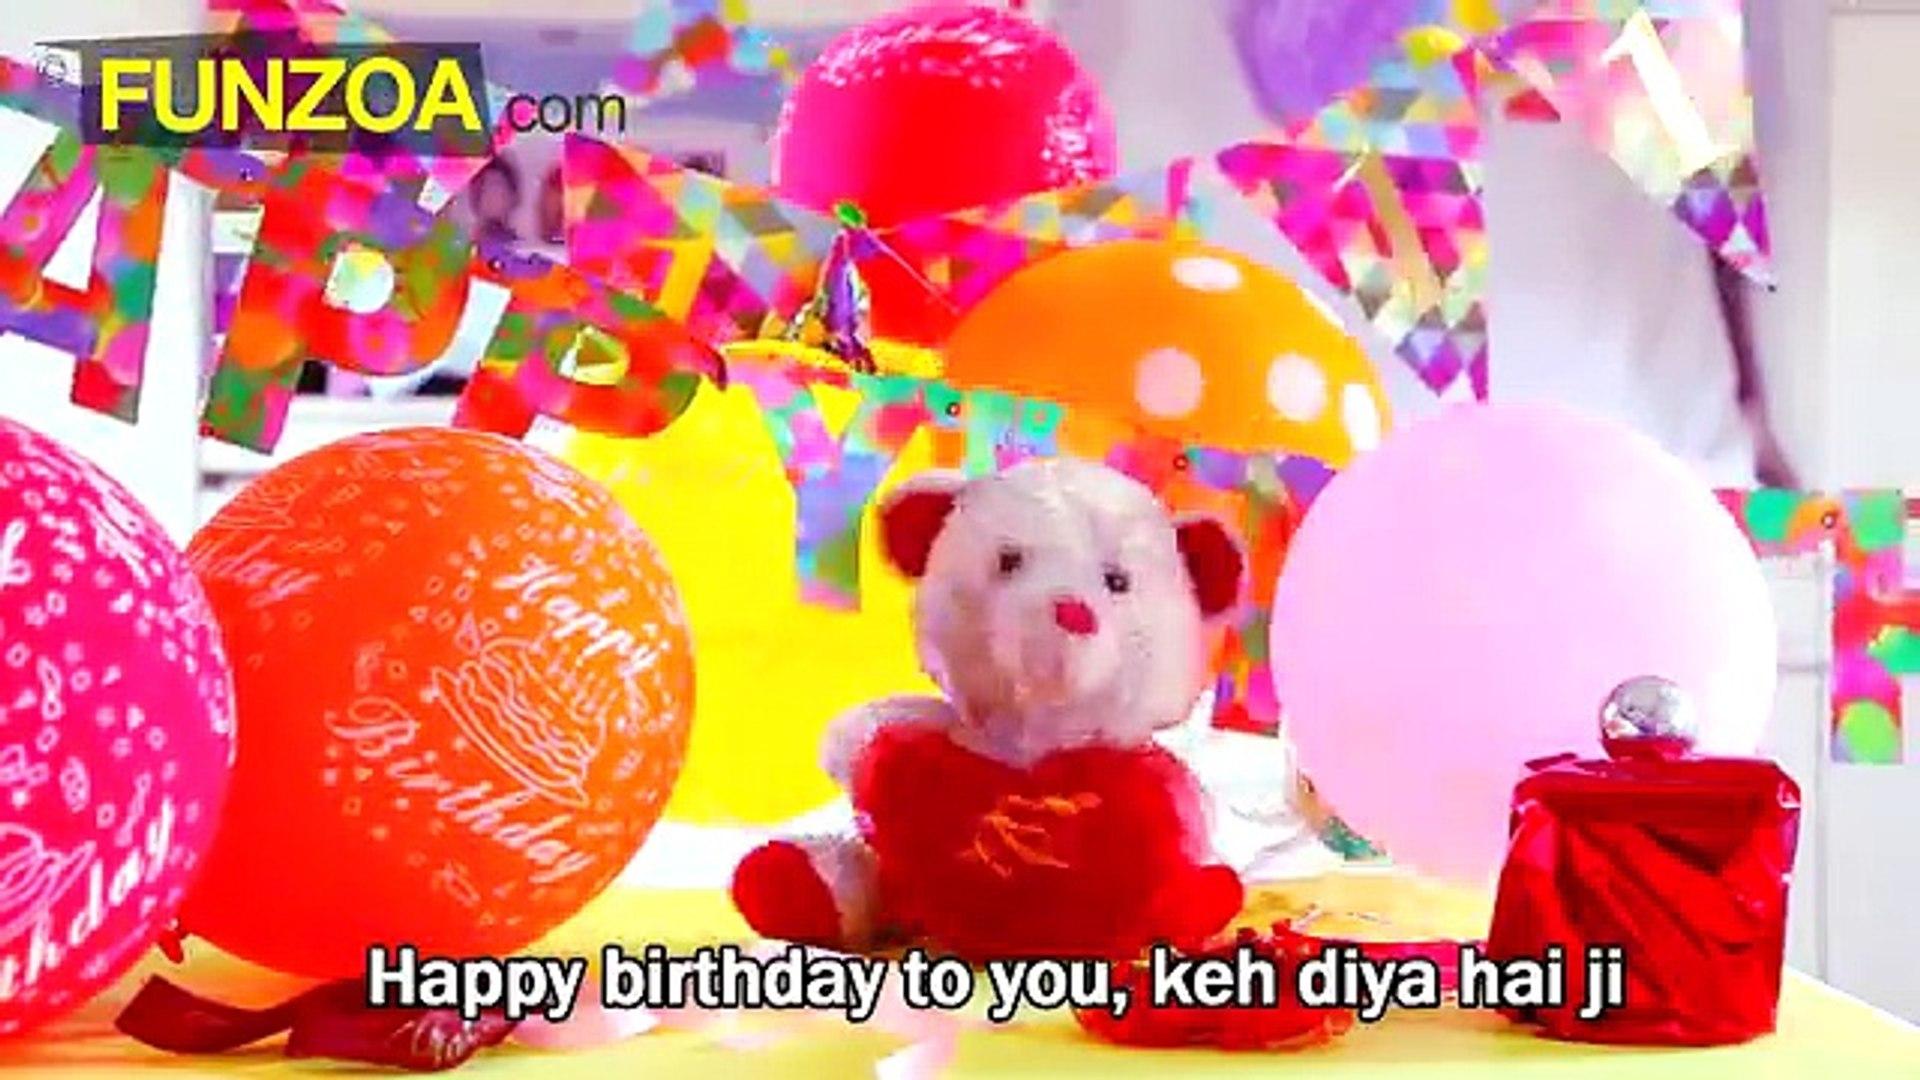 Funny Hindi Birthday Song - Funzoa Mimi Teddy